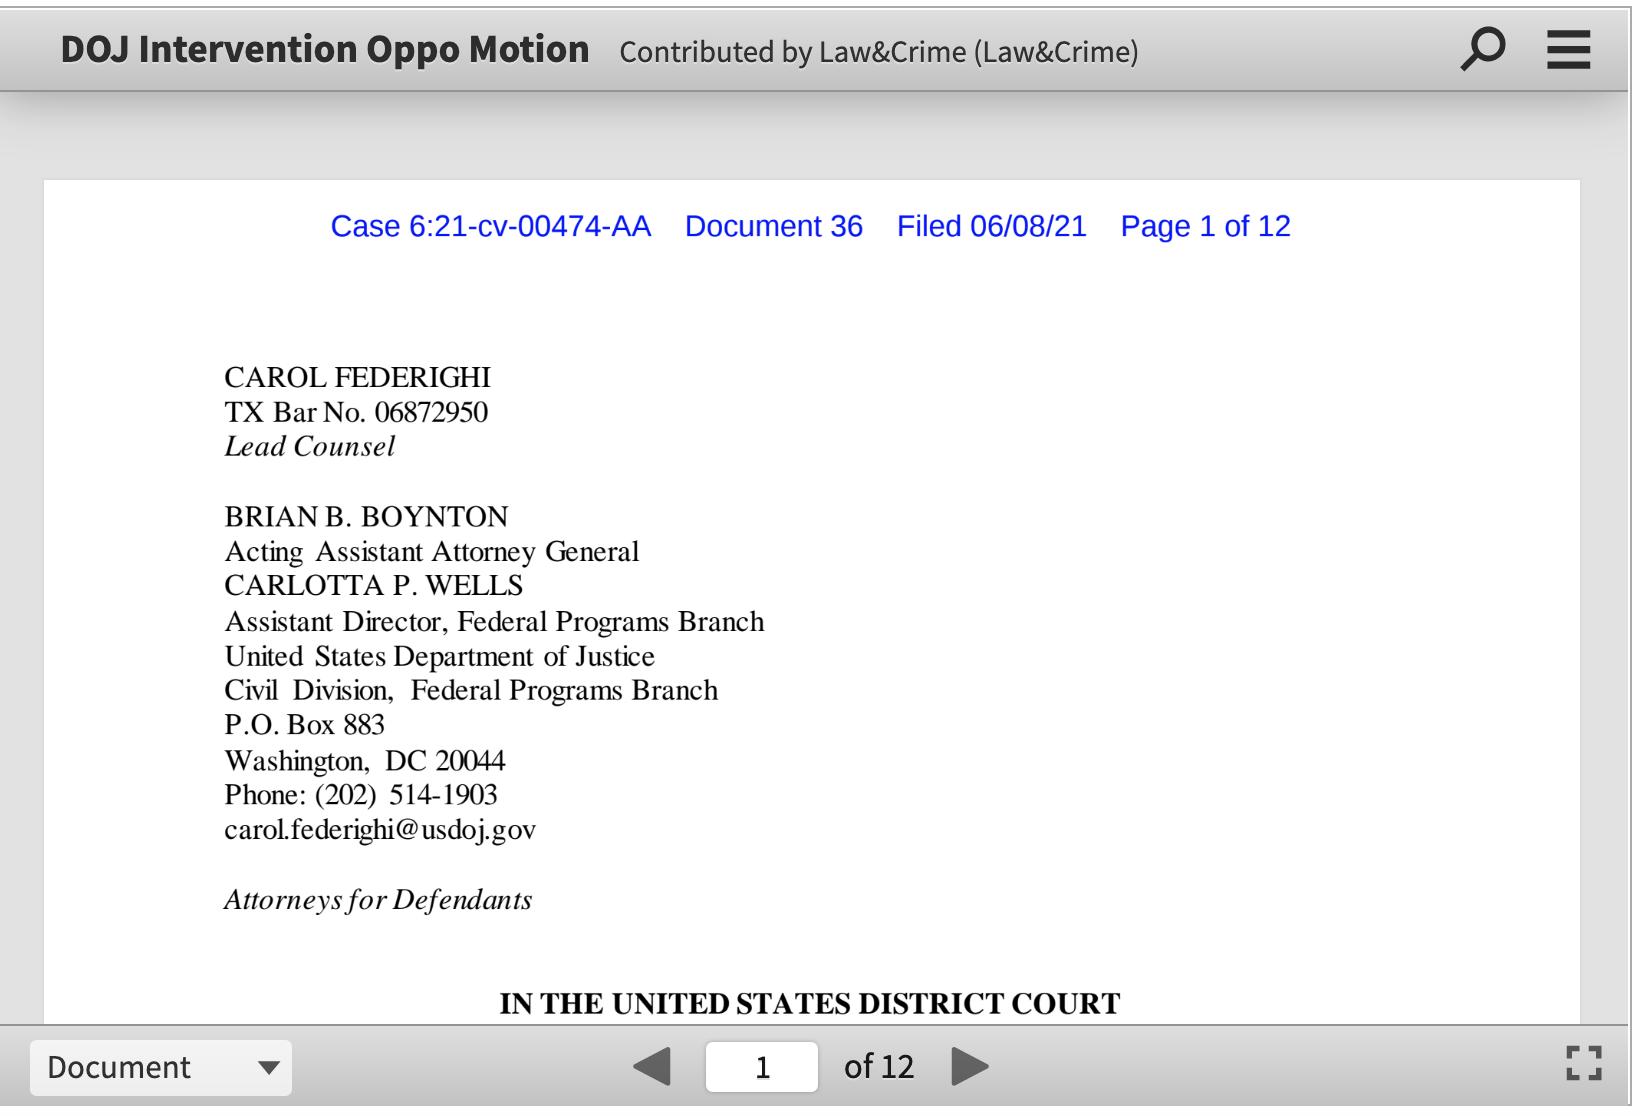 Screen-Shot-2021-06-09-at-6.31.19-PM Garland Defends Law That Lets Religious Schools Discriminate Against LGBTQ Featured Joe Biden LGBT Politics Top Stories